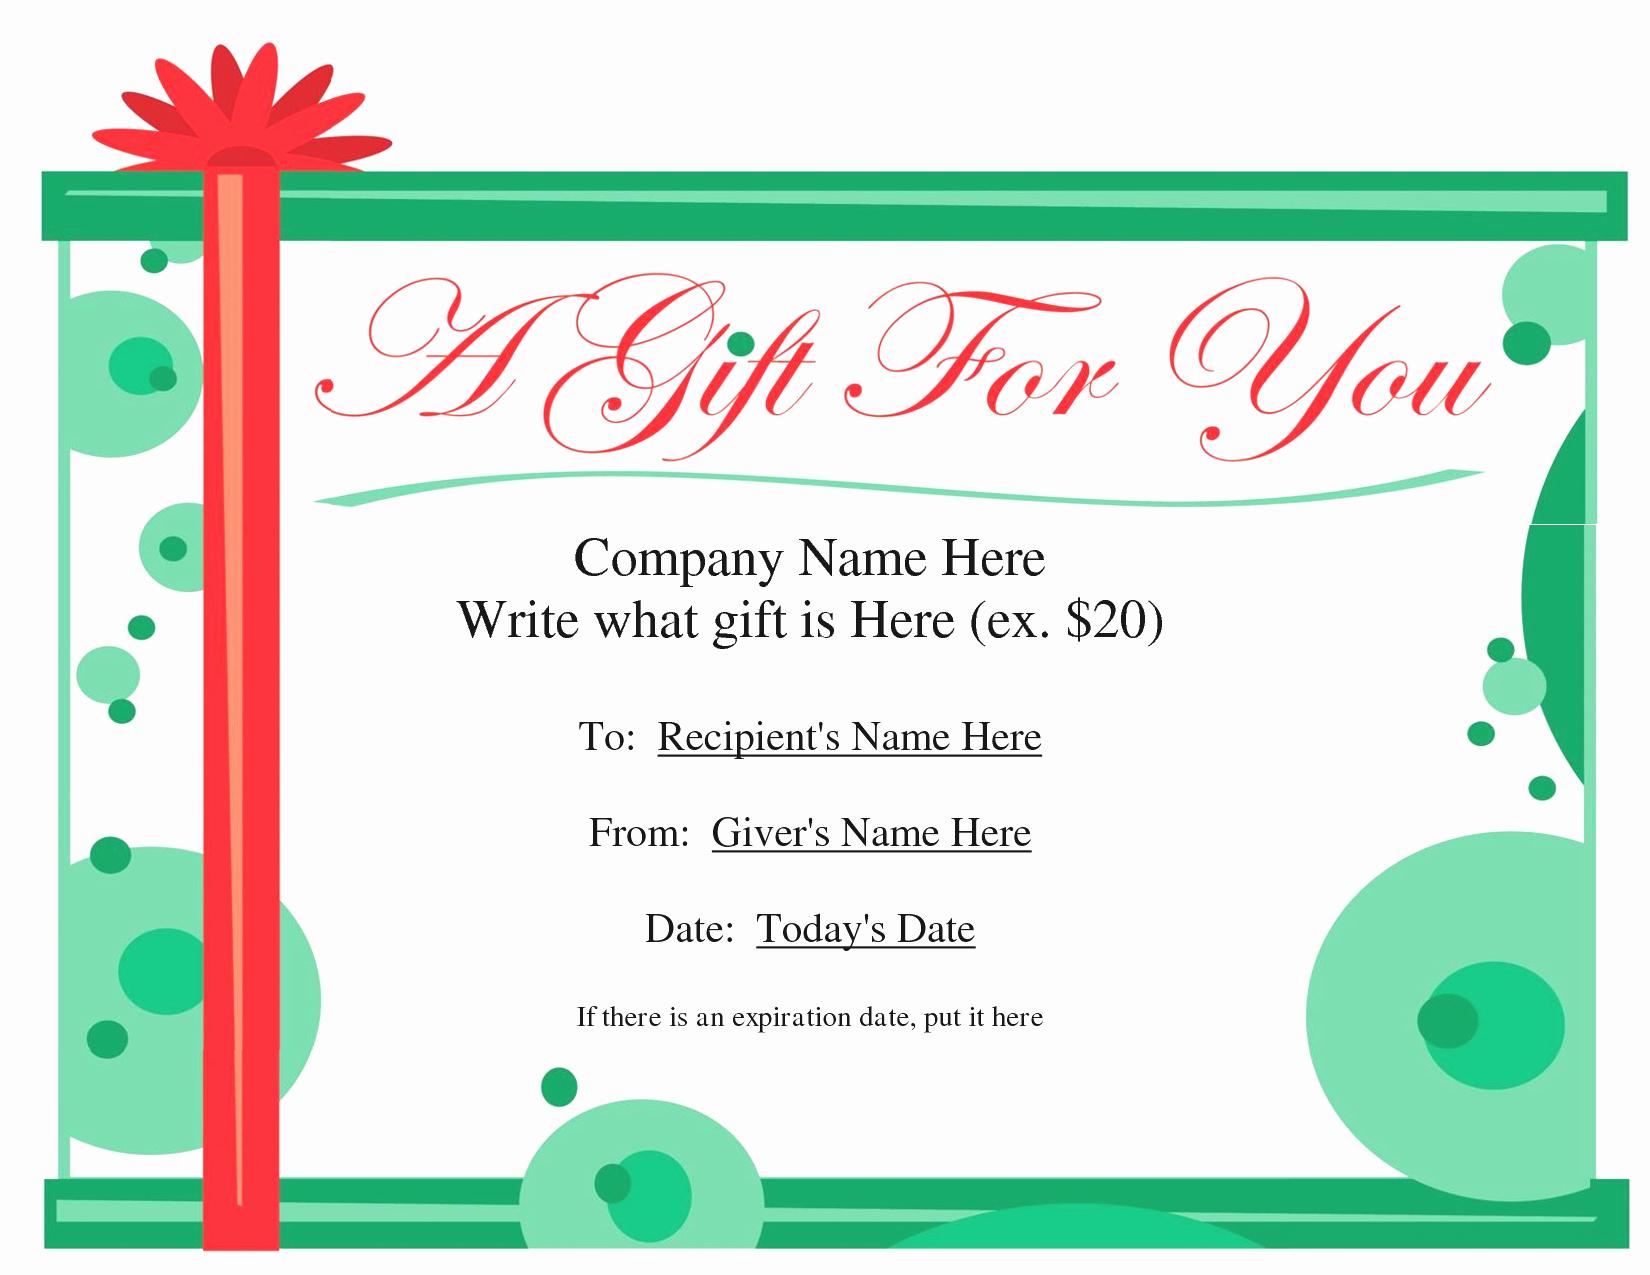 Microsoft Fice Gift Certificate Template